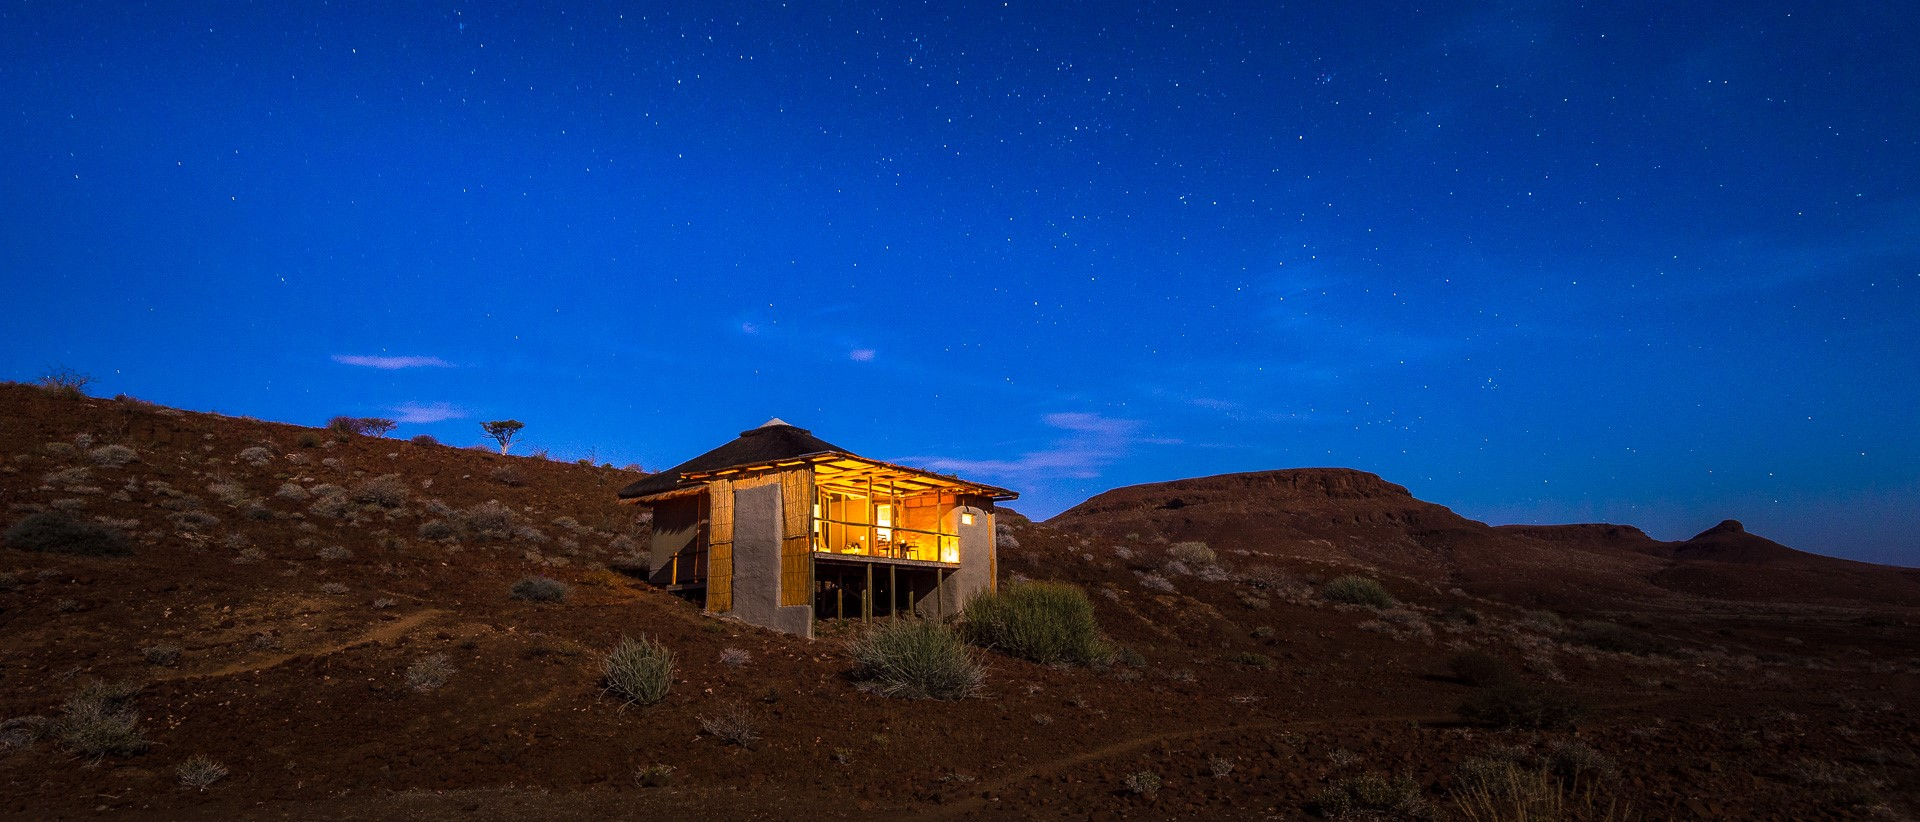 damaraland-camp-namibia-night